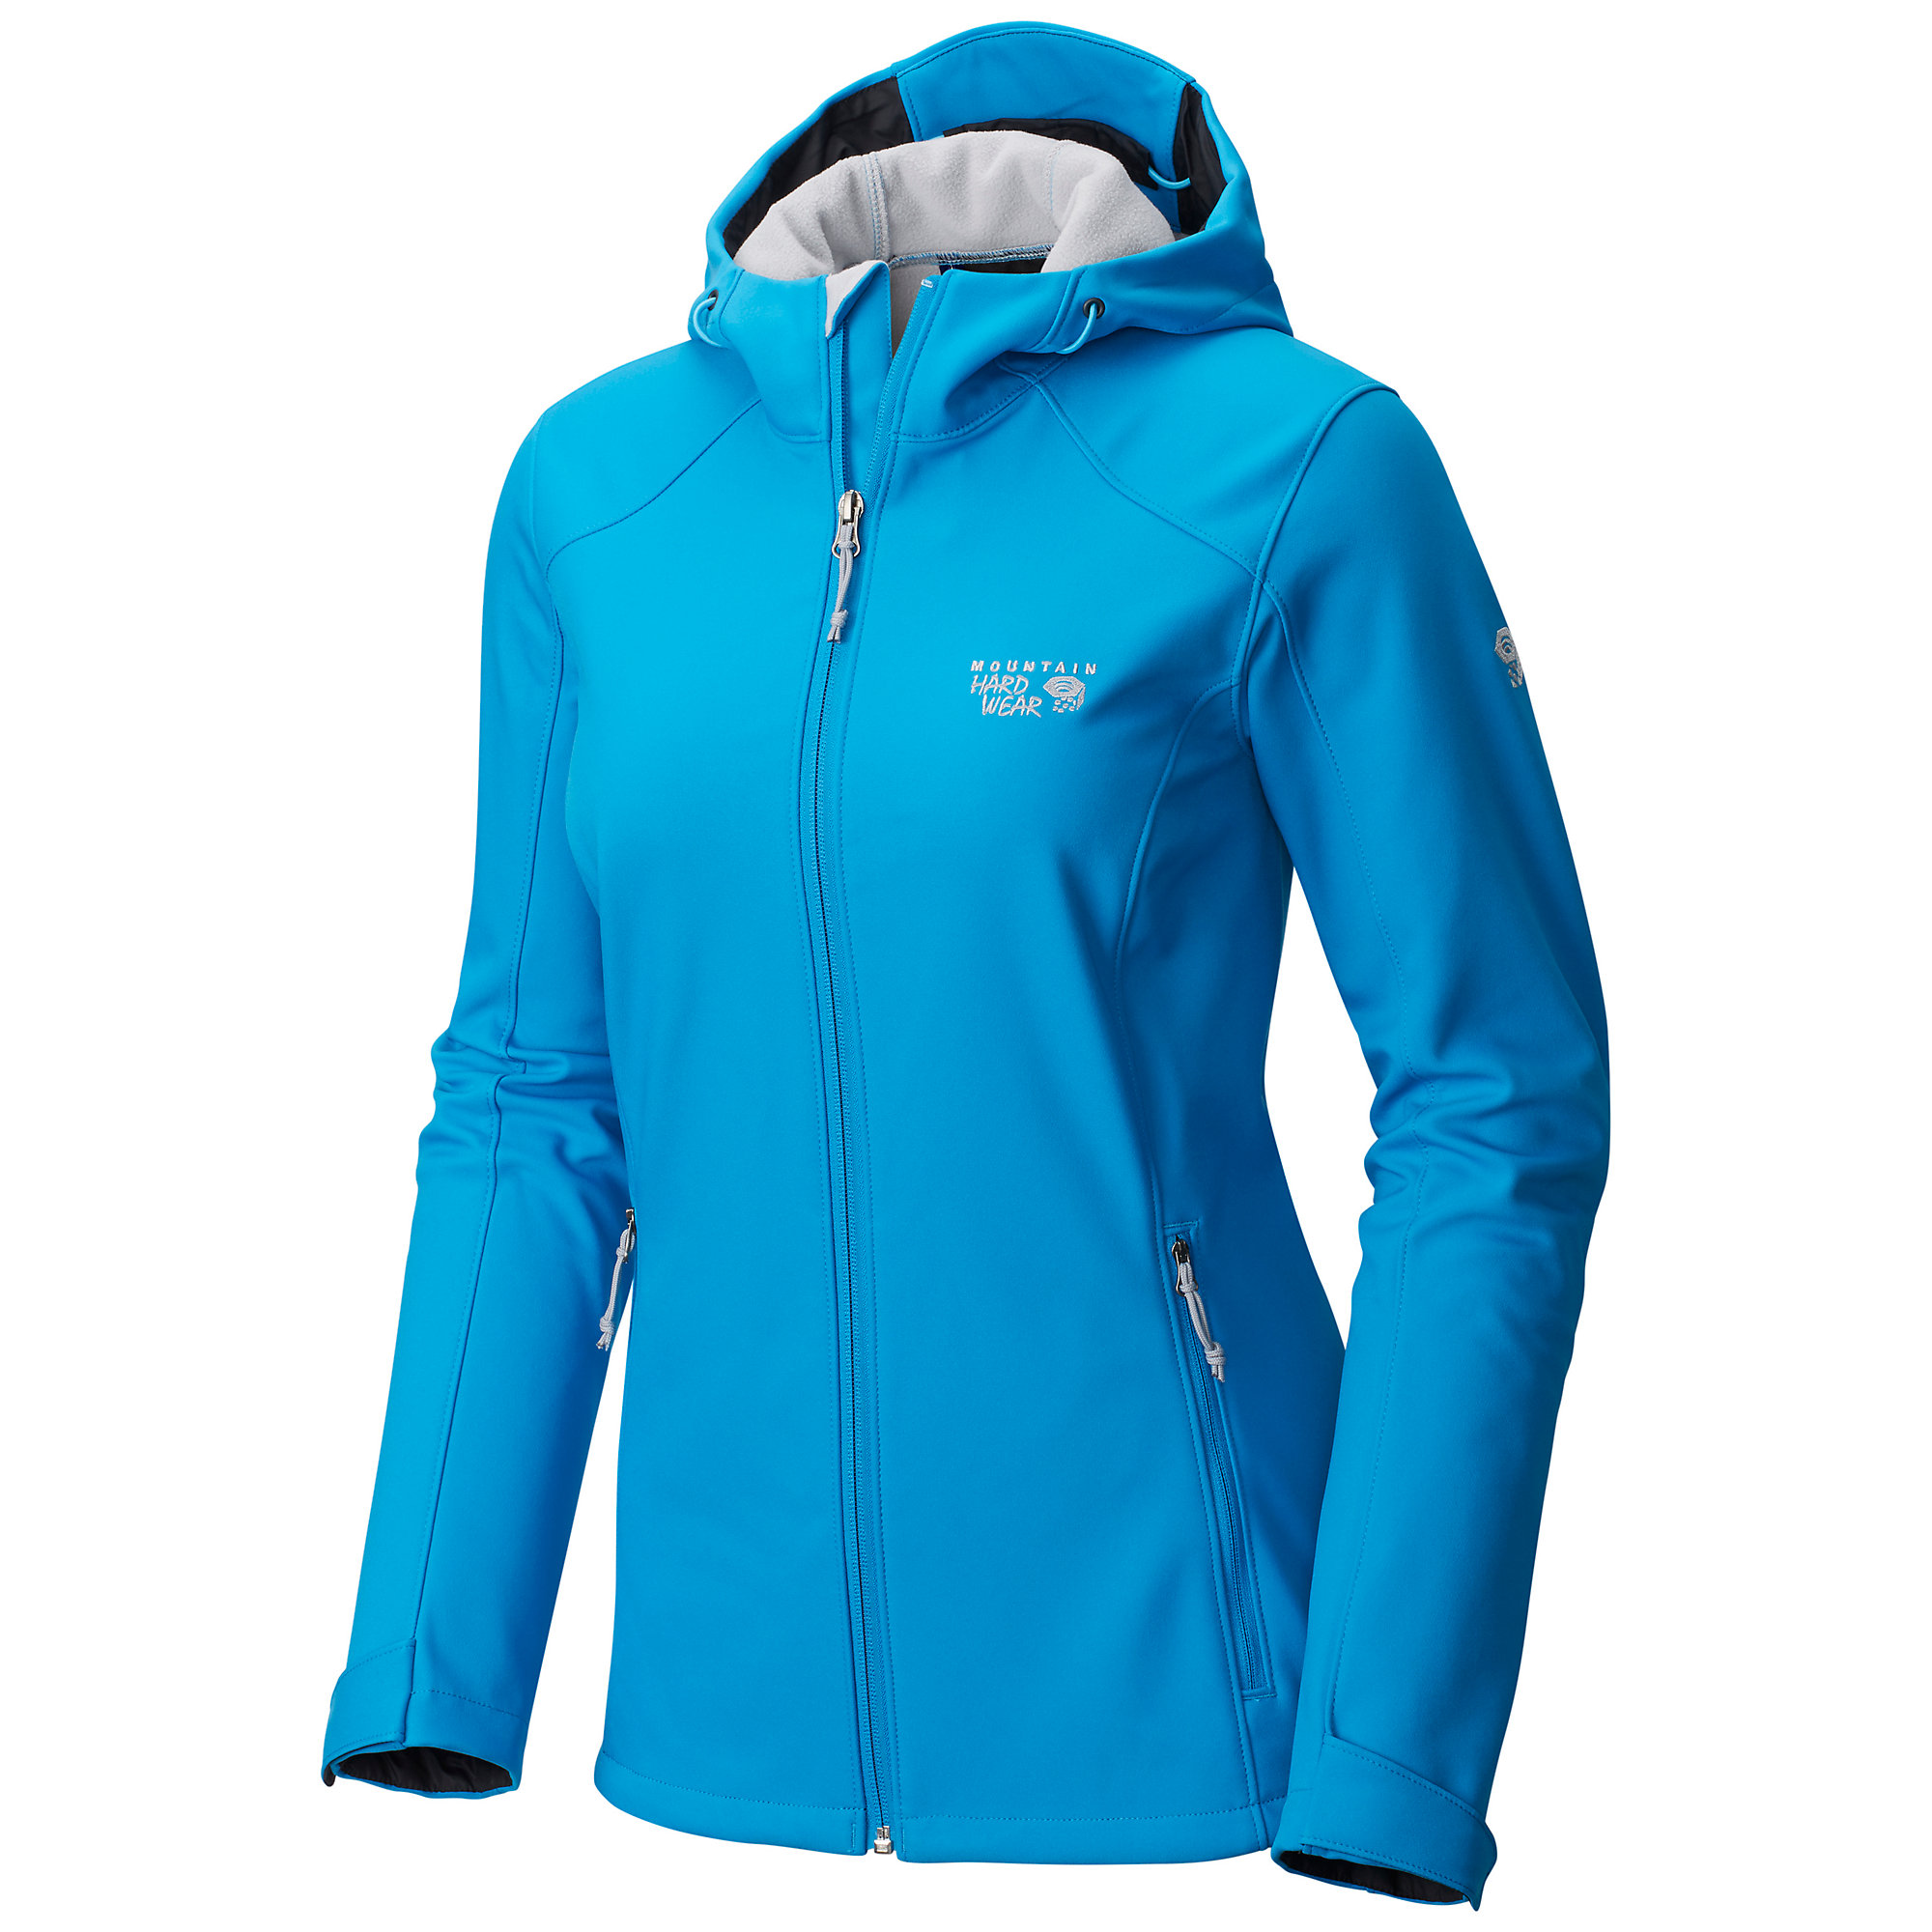 Mountain Hardwear Classic Principia Softshell Jacket